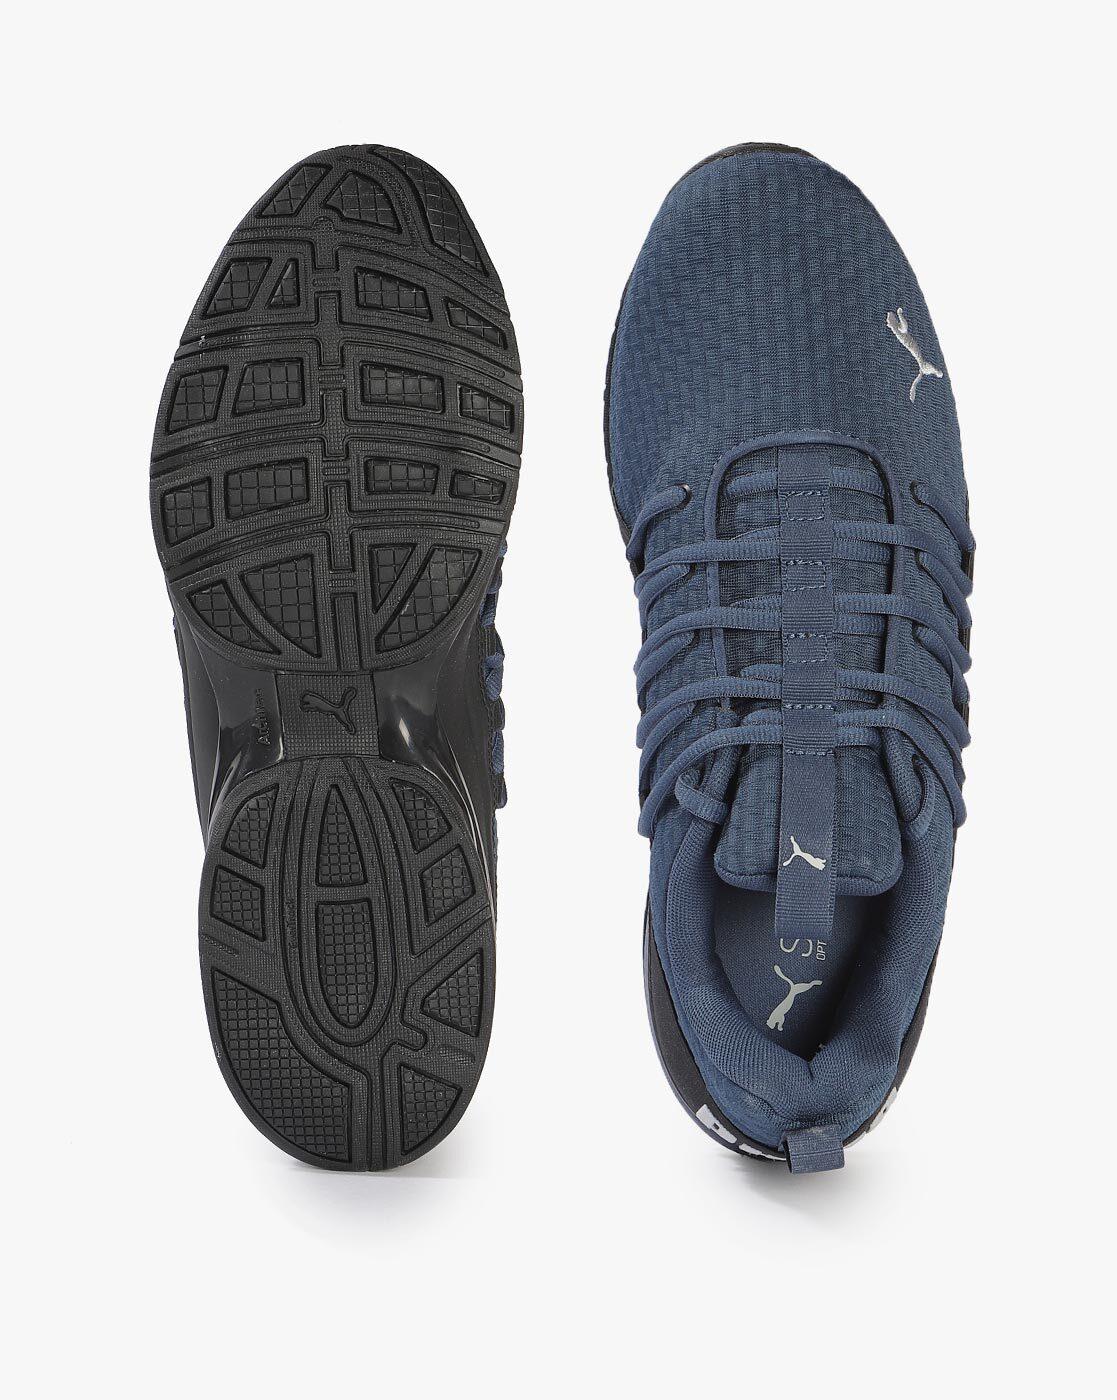 PUMA Axelion Block Ghillie Lace-Up Sports Shoes